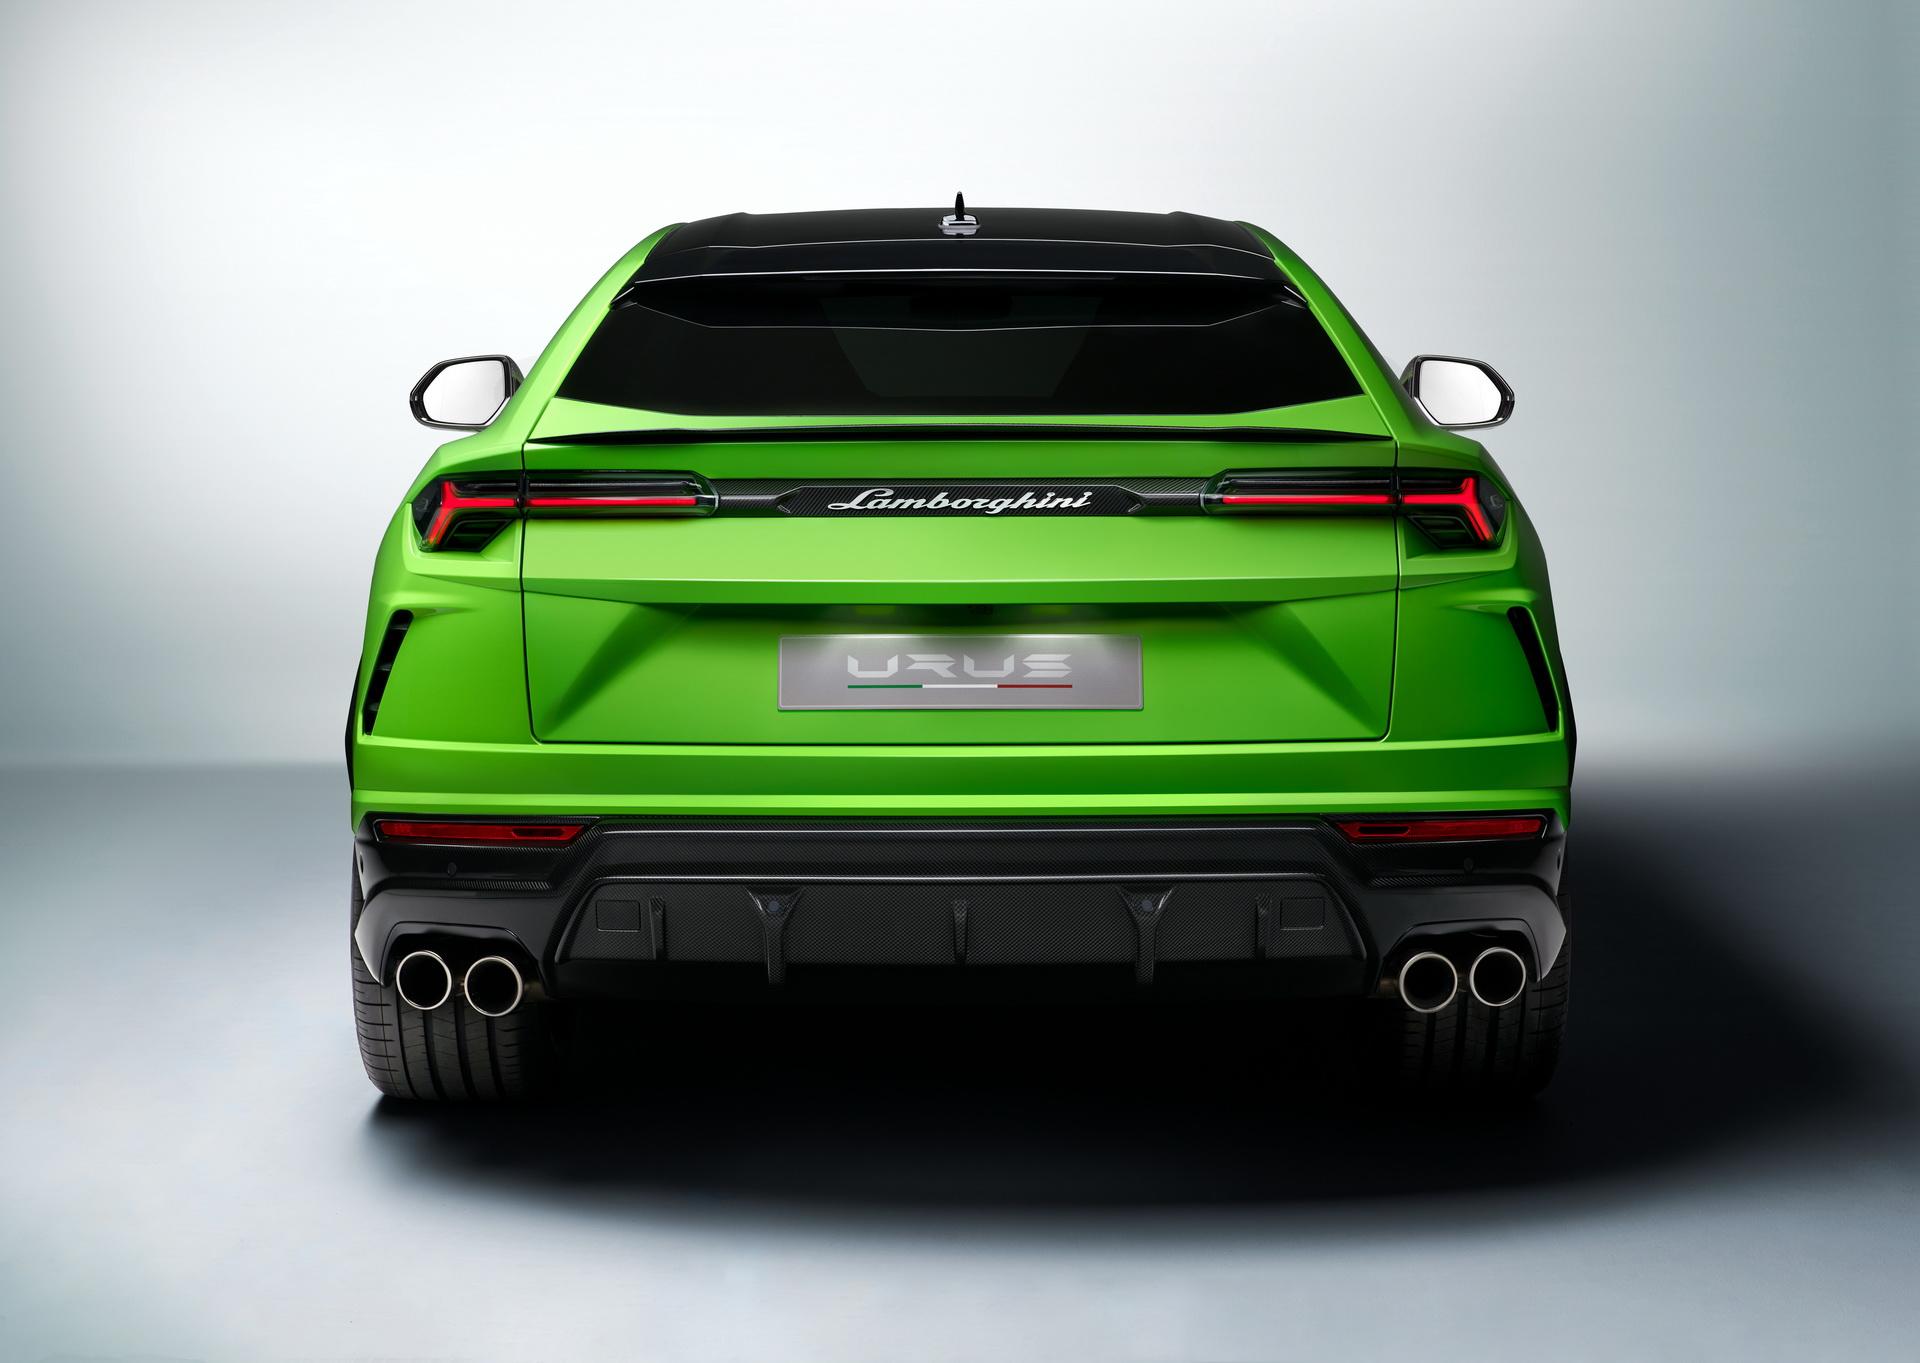 Lamborghini-Urus-Pearl-Capsule-Edition-6